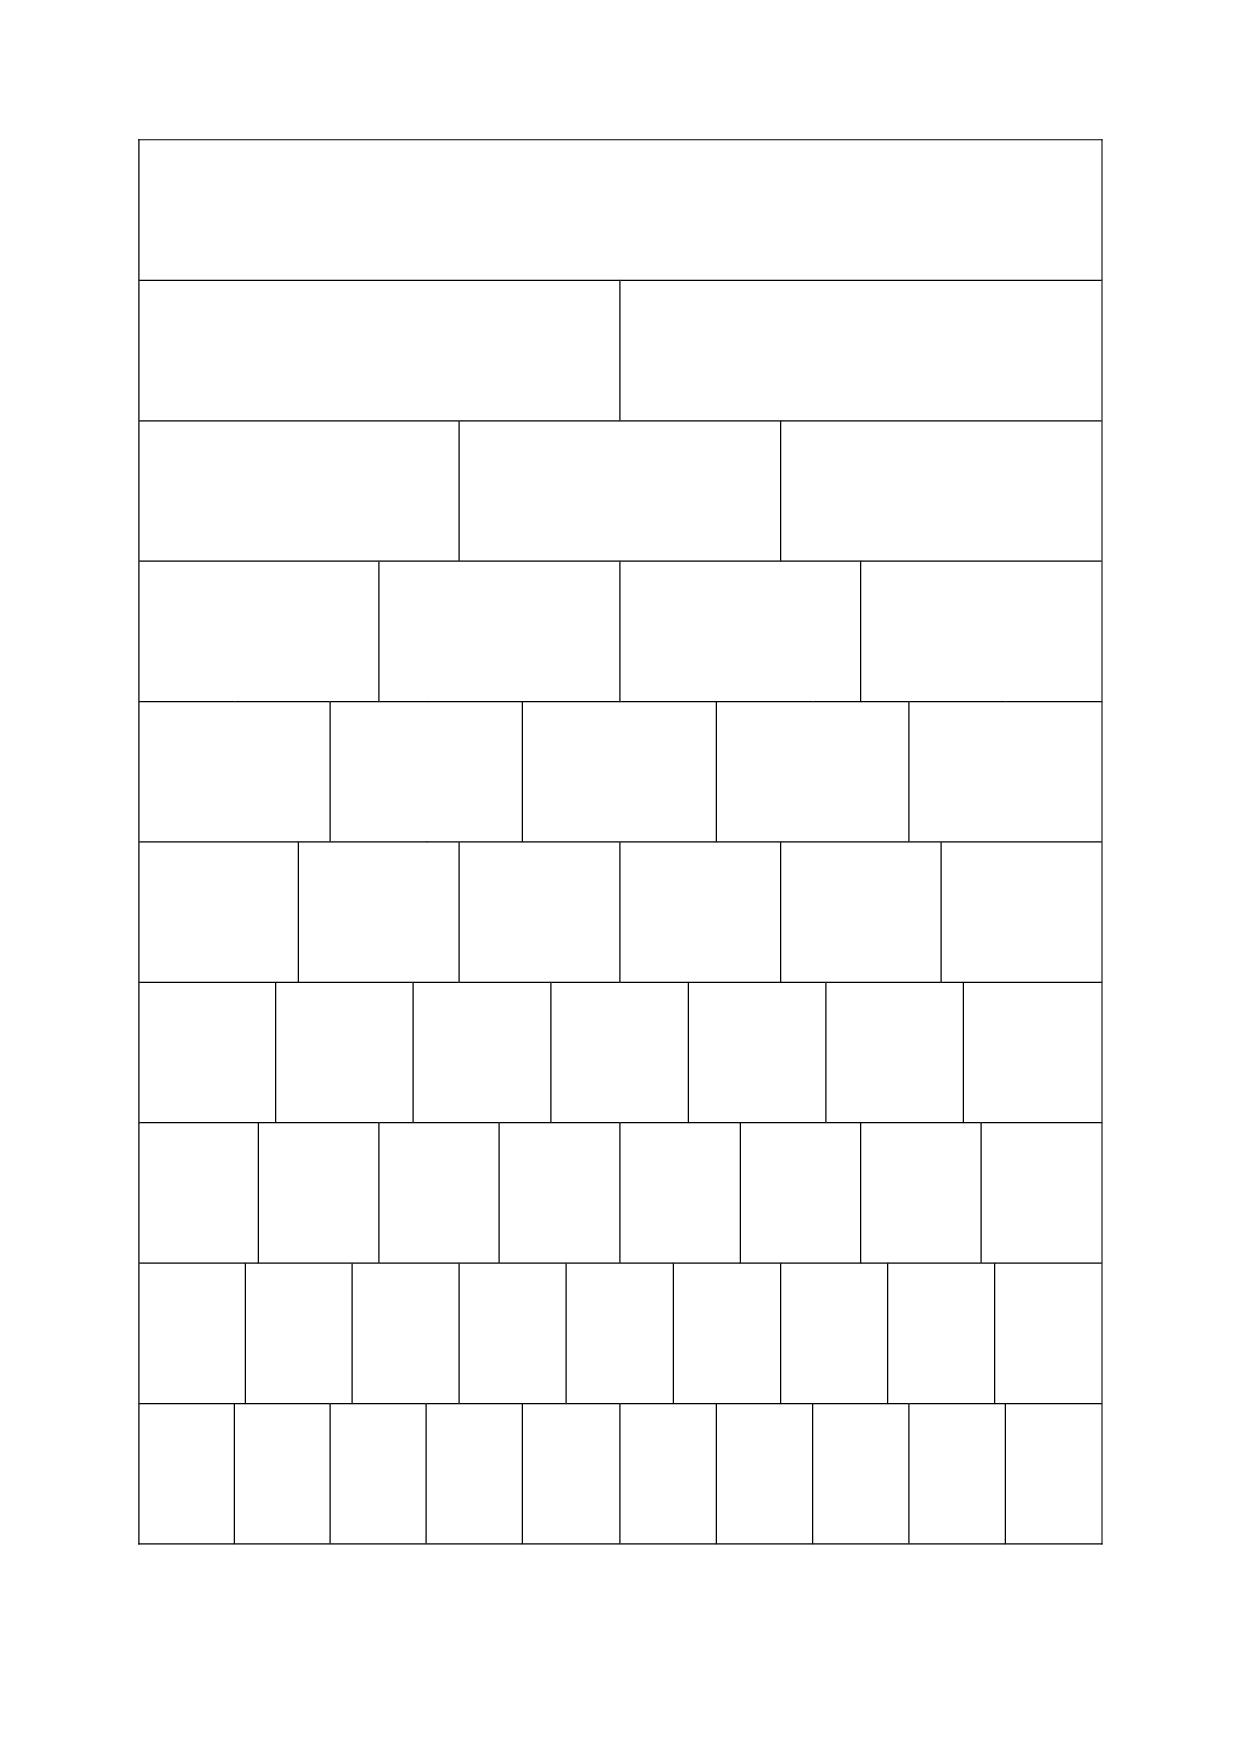 blank fraction wall  calendar june  best images of printable fraction wall  blank fraction wall